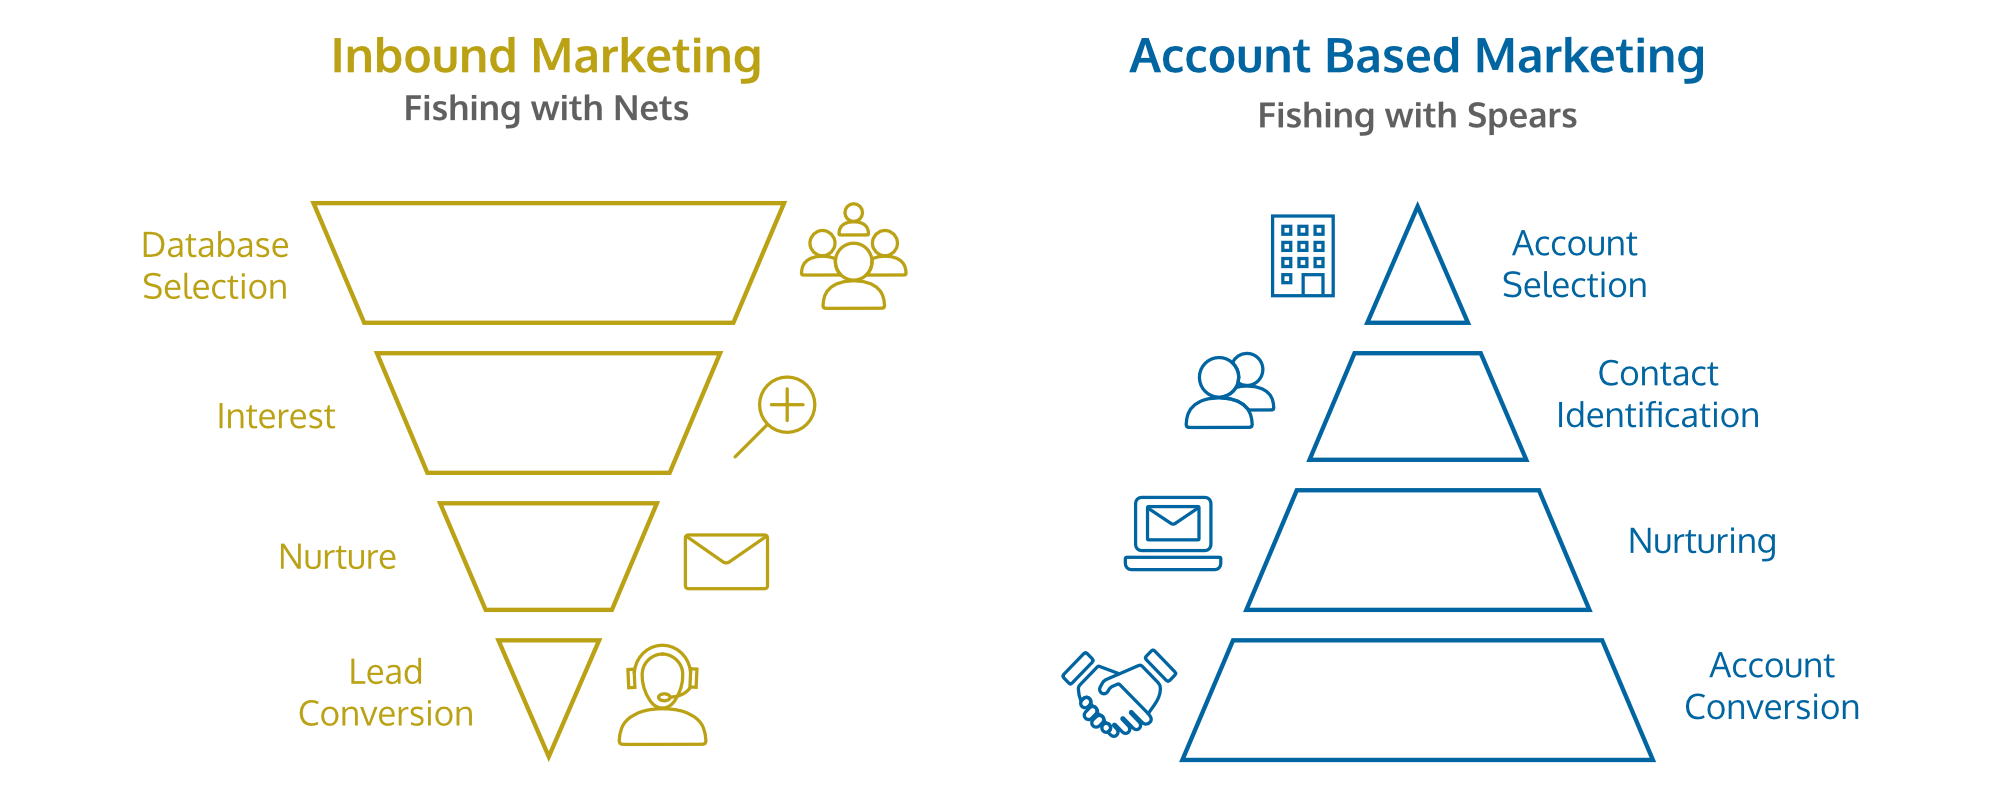 Groworks - Inbound Marketing vs Account Based Marketing